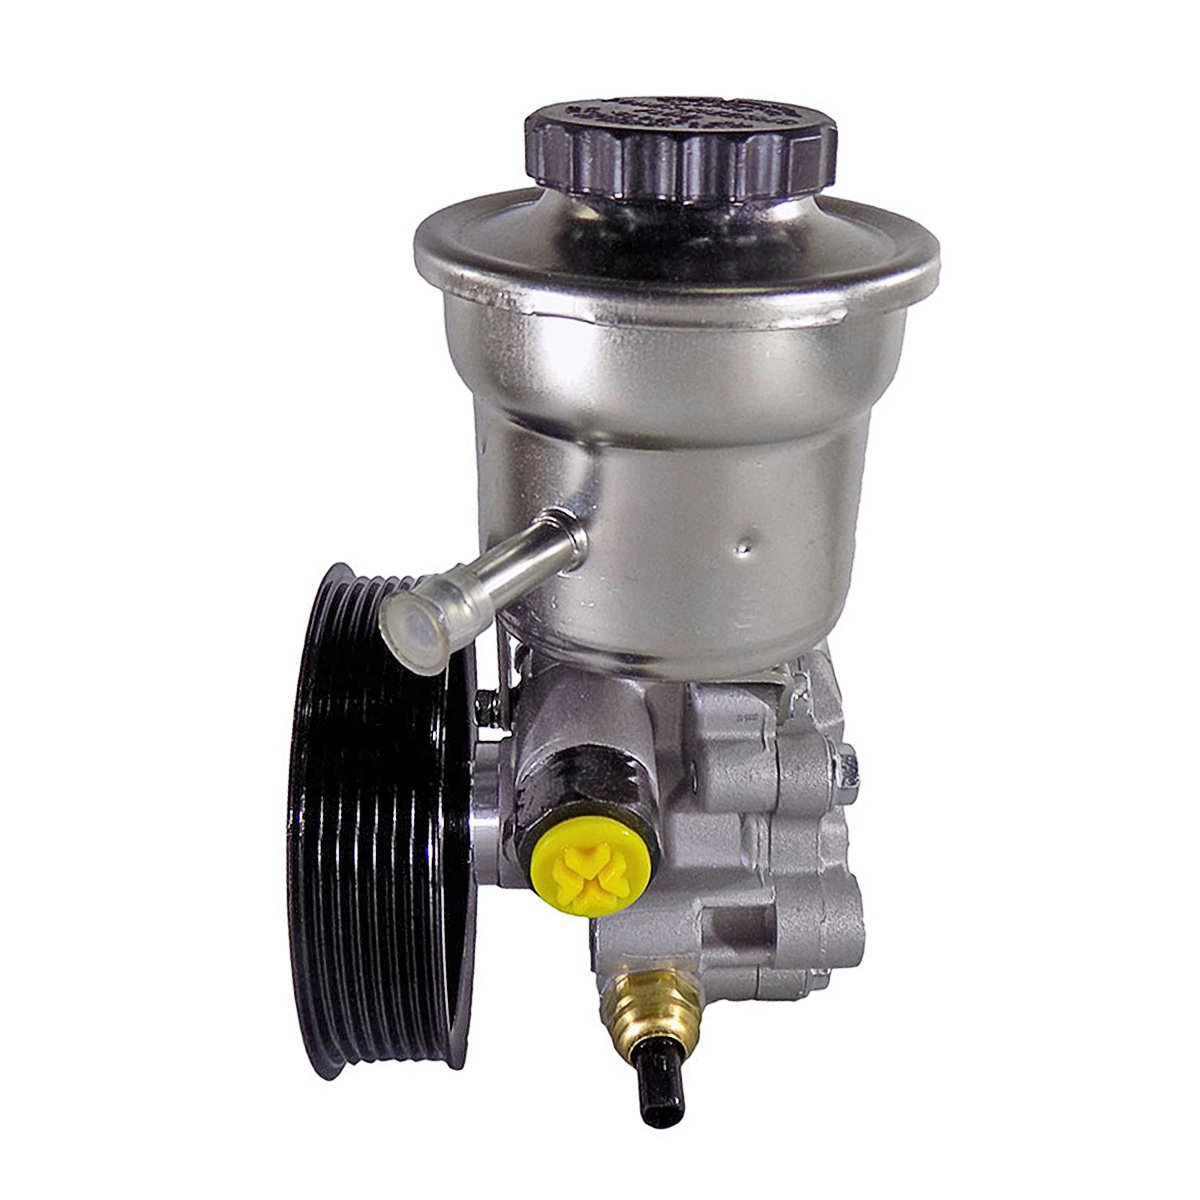 Amazon.com: Power Steering Pump For Toyota Fortuner Hilux Innova SW4 2.0L 2.7L 1TR-FE 2TR-FE 44310-0K010: Automotive